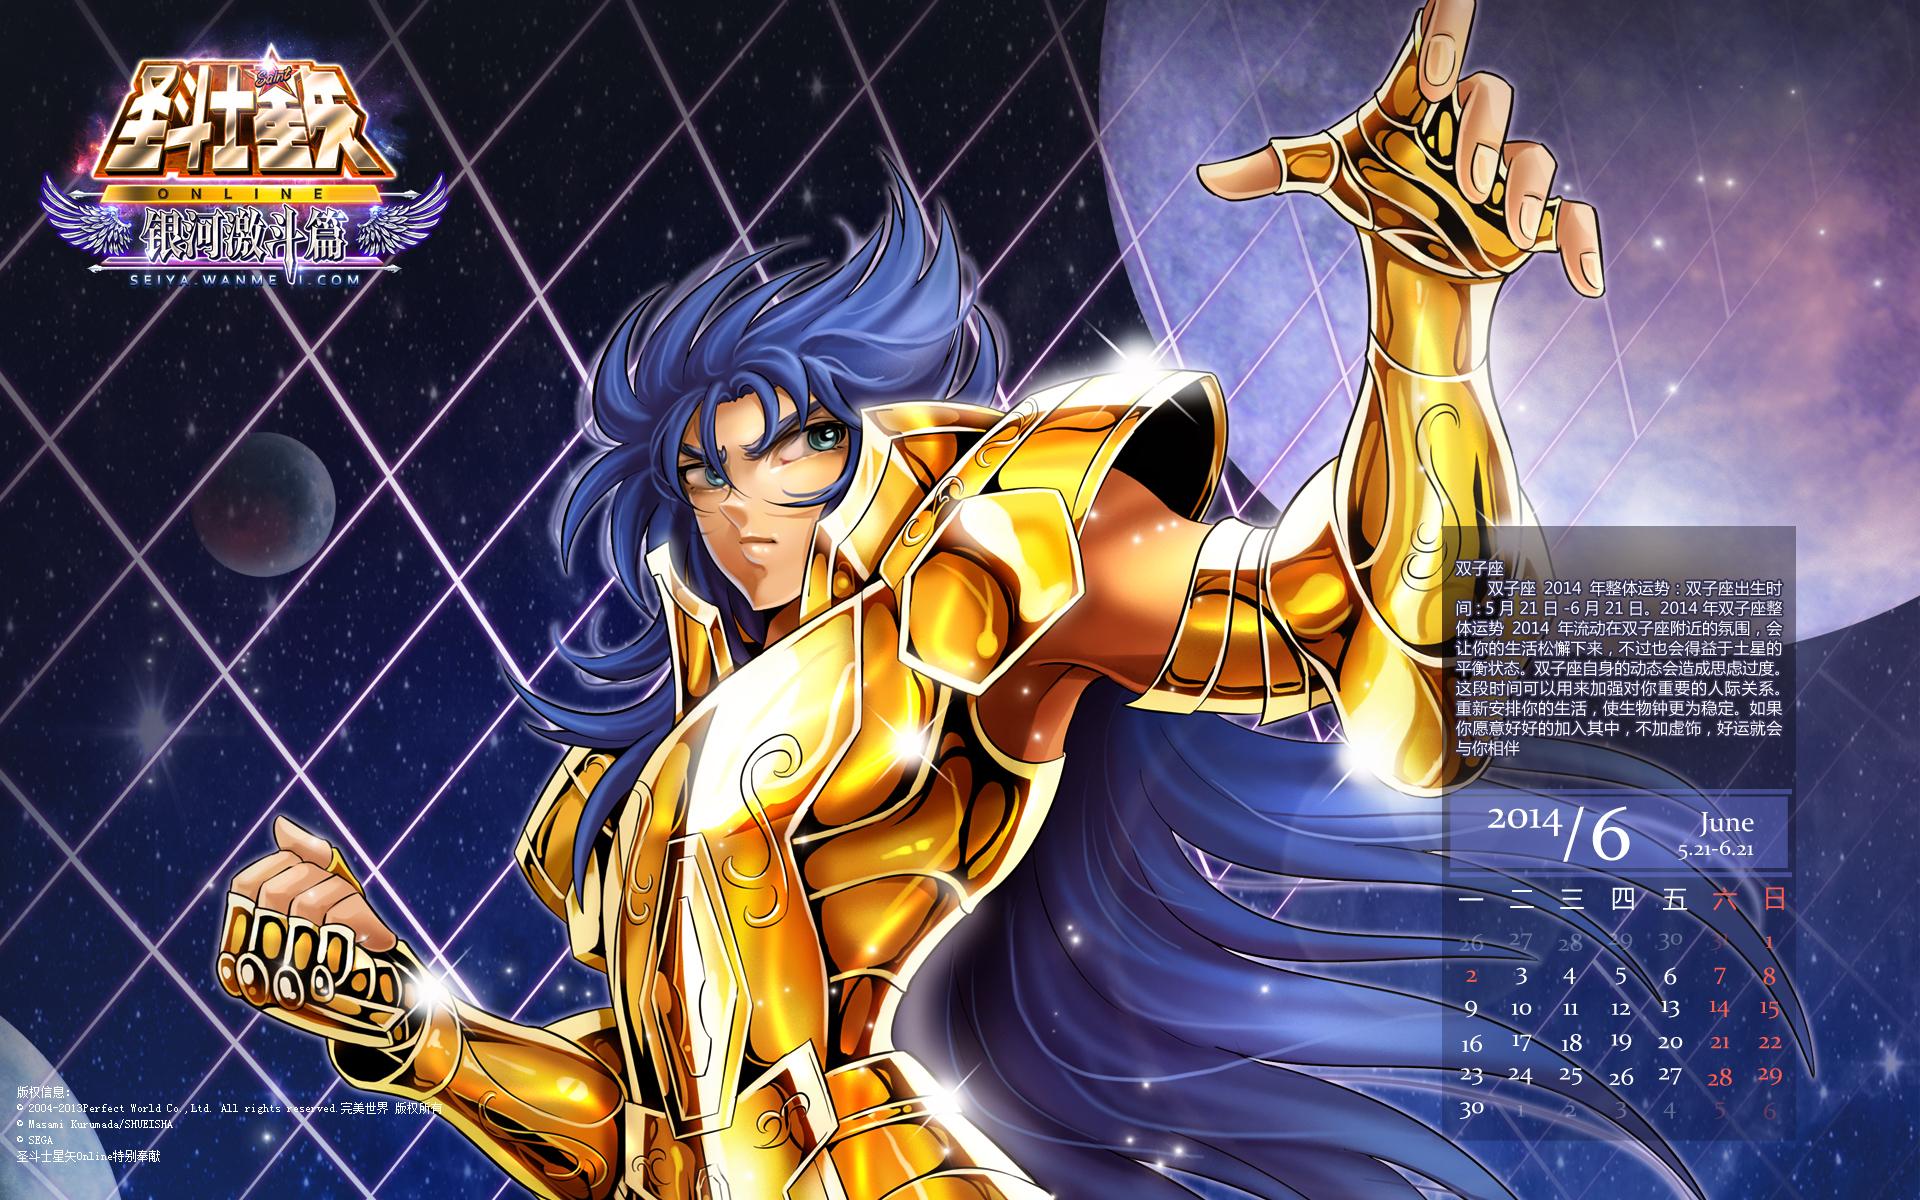 saint seiya wallpaper page 2 zerochan anime image board